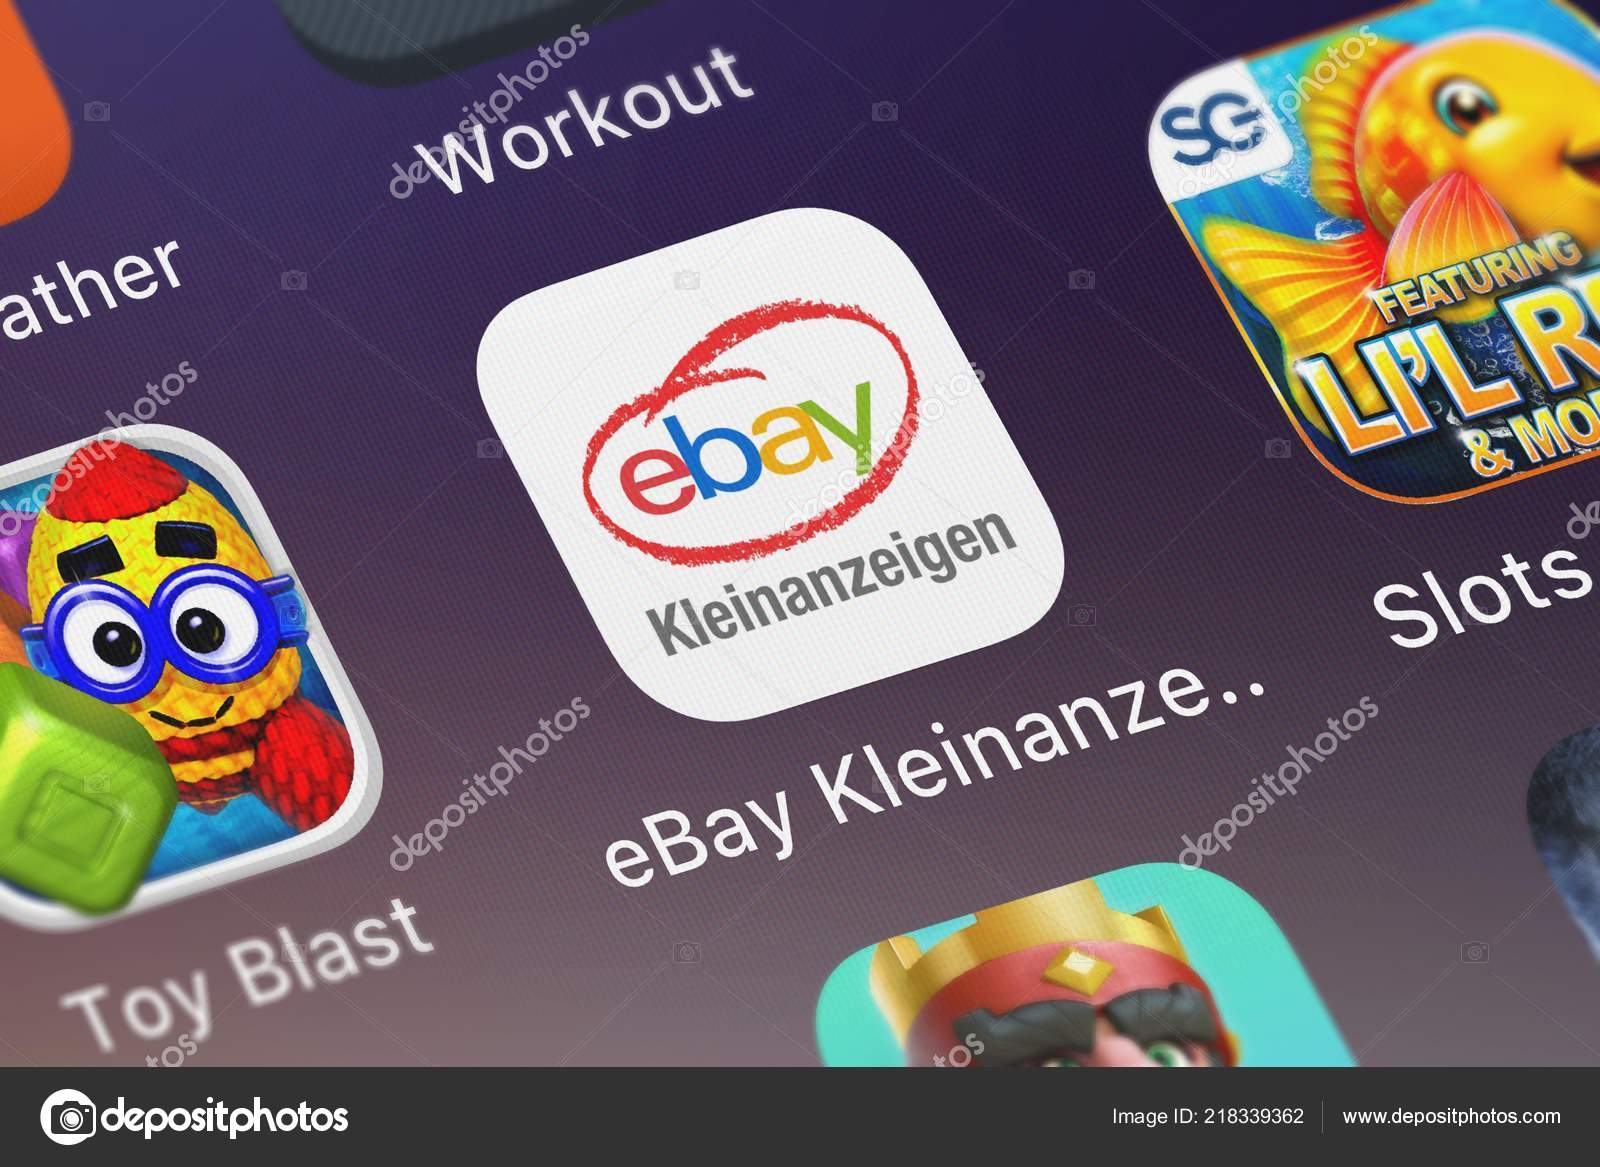 London United Kingdom October 2018 Ebay Kleinanzeigen Mobile App Marktplaats Stock Editorial Photo C Opturadesign 218339362